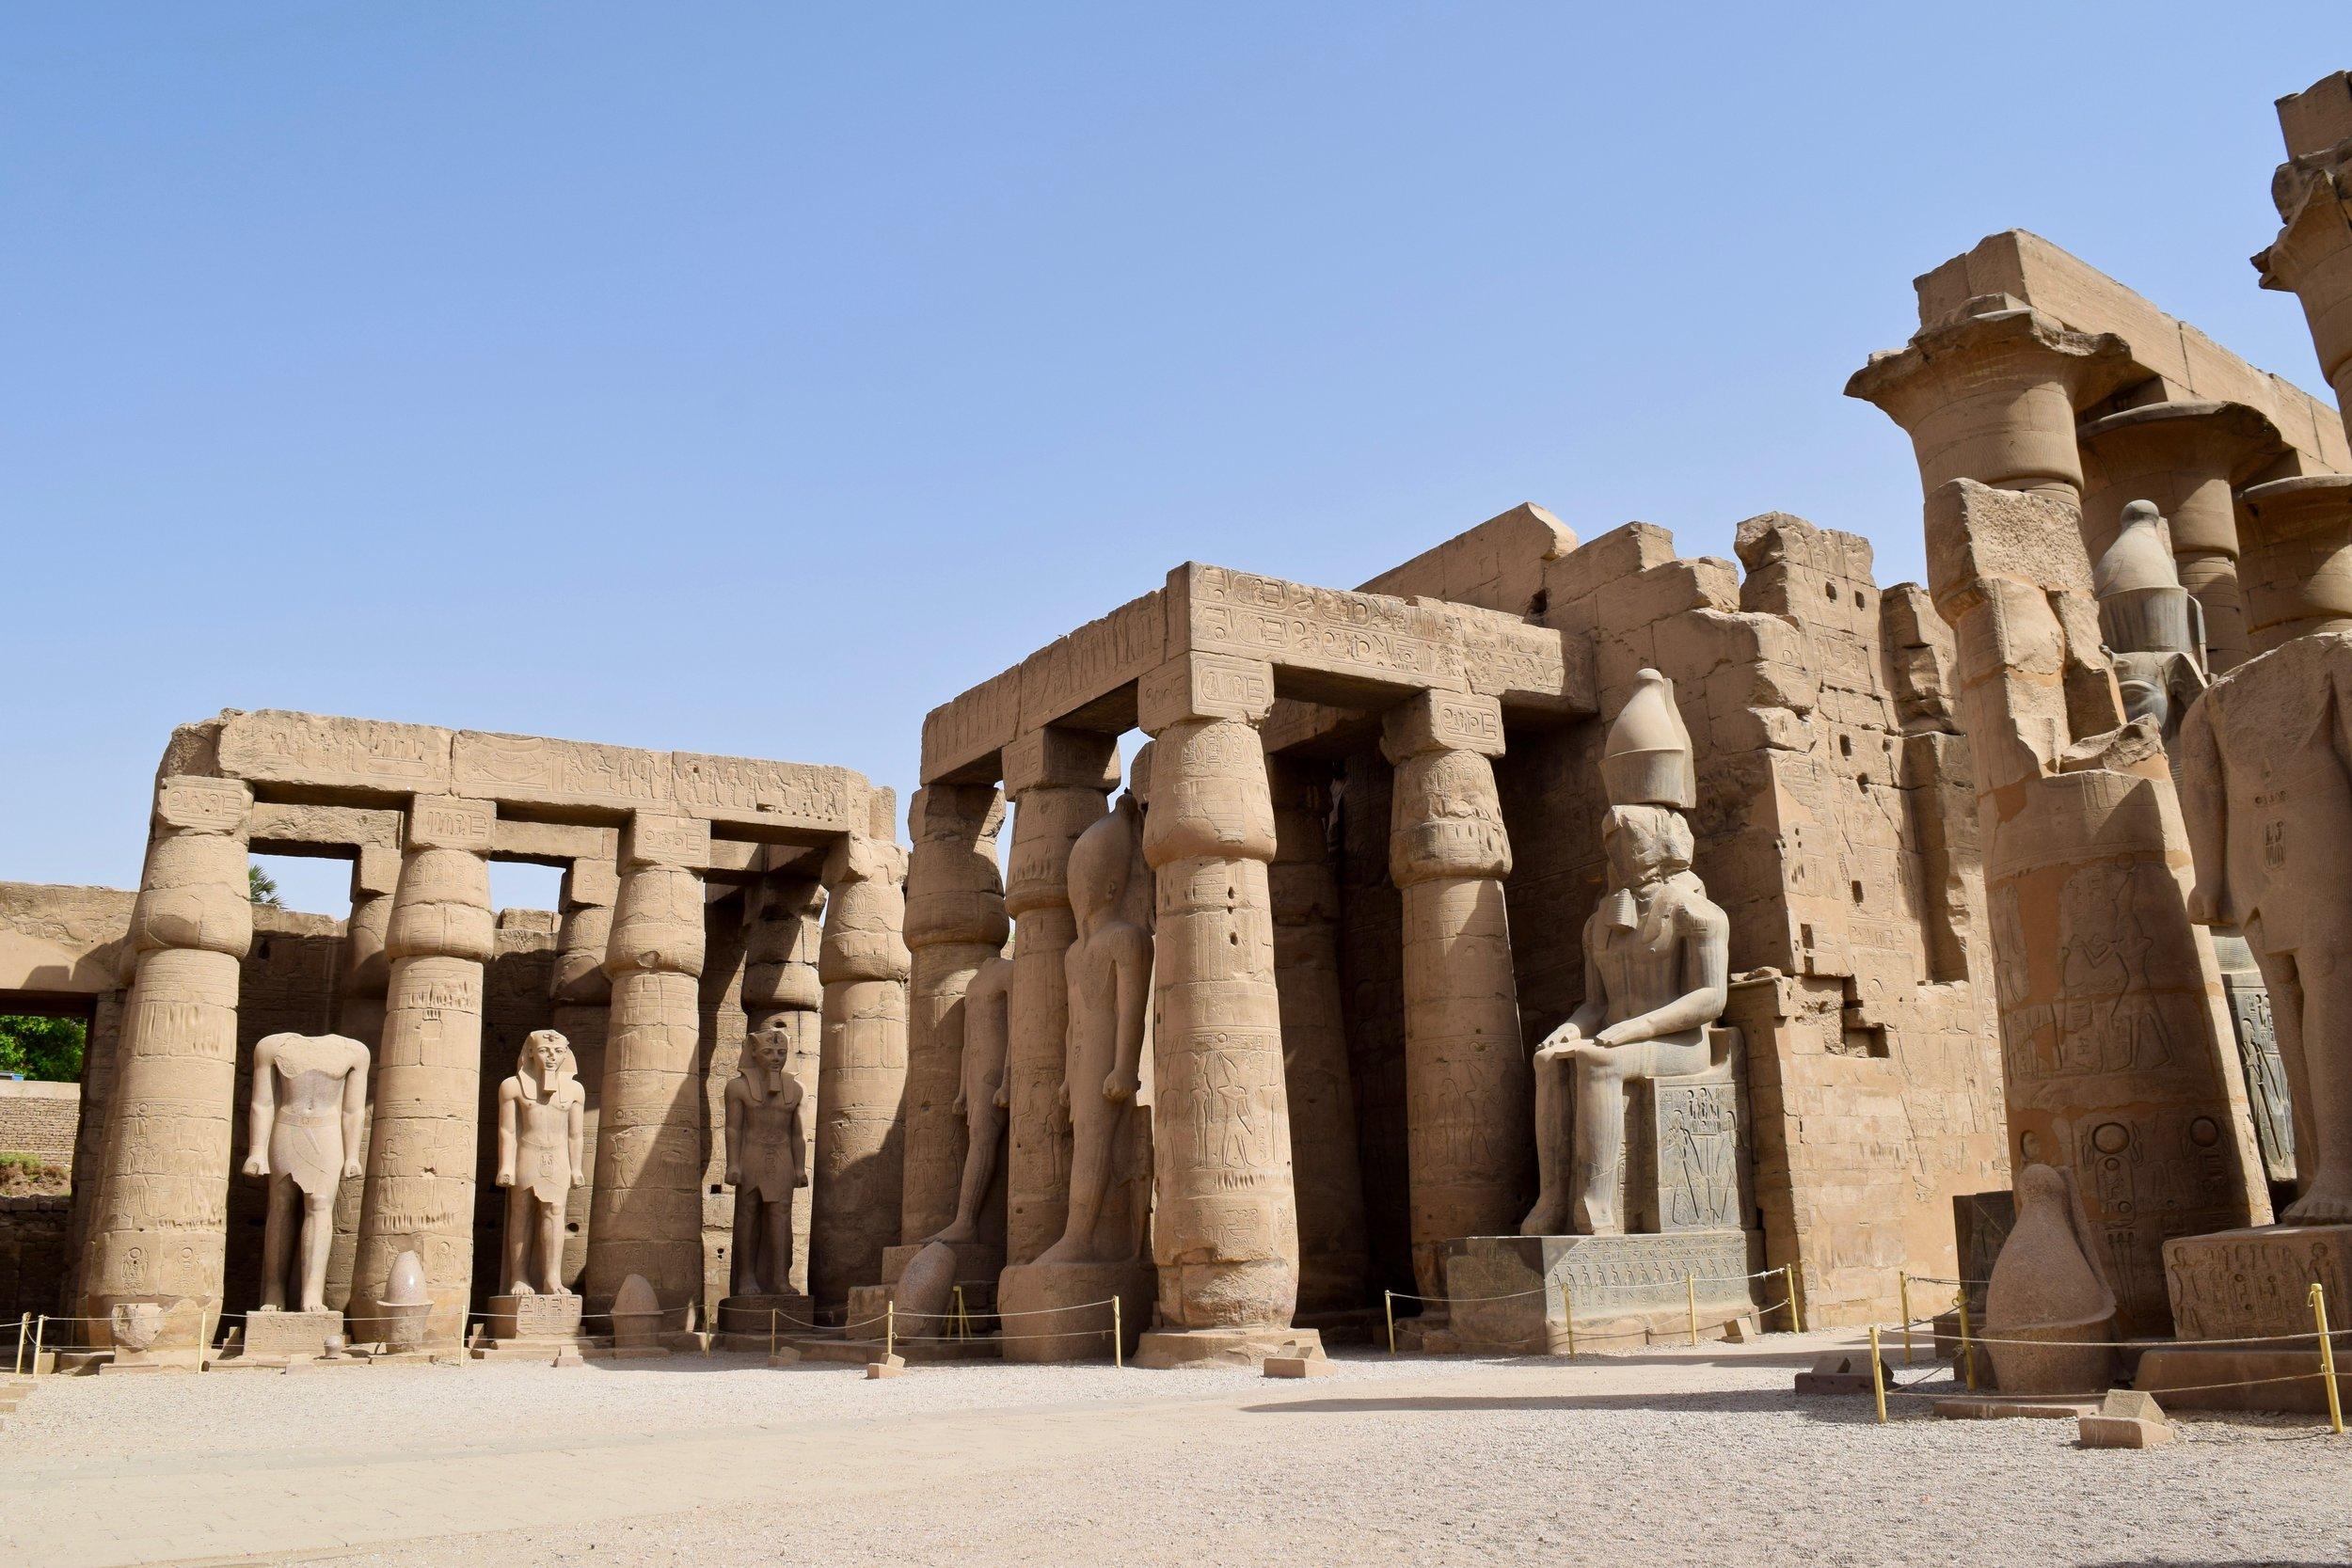 Rameses II's court